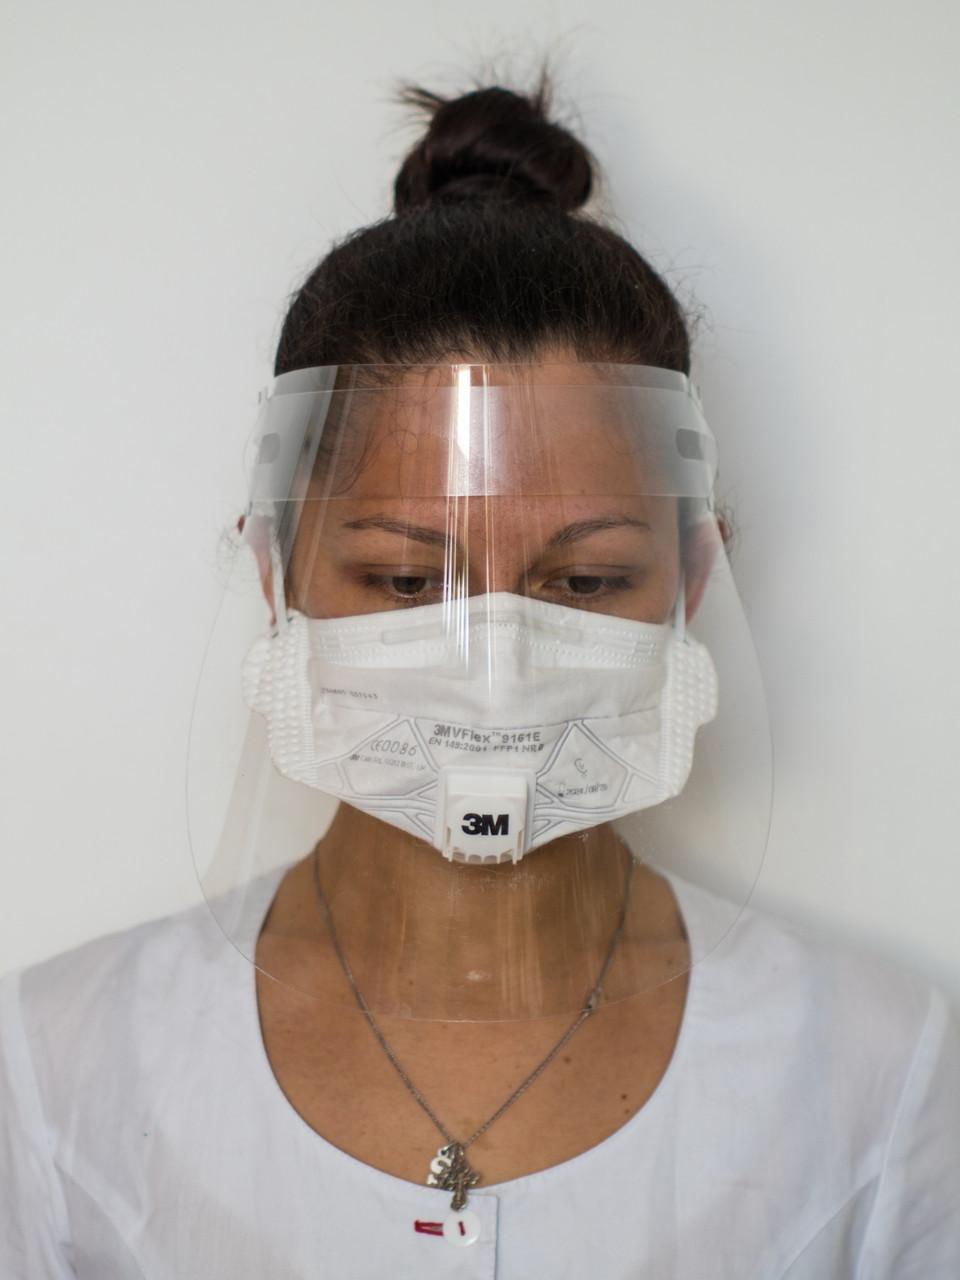 Защитный экран, маска, защита от вируса для лица